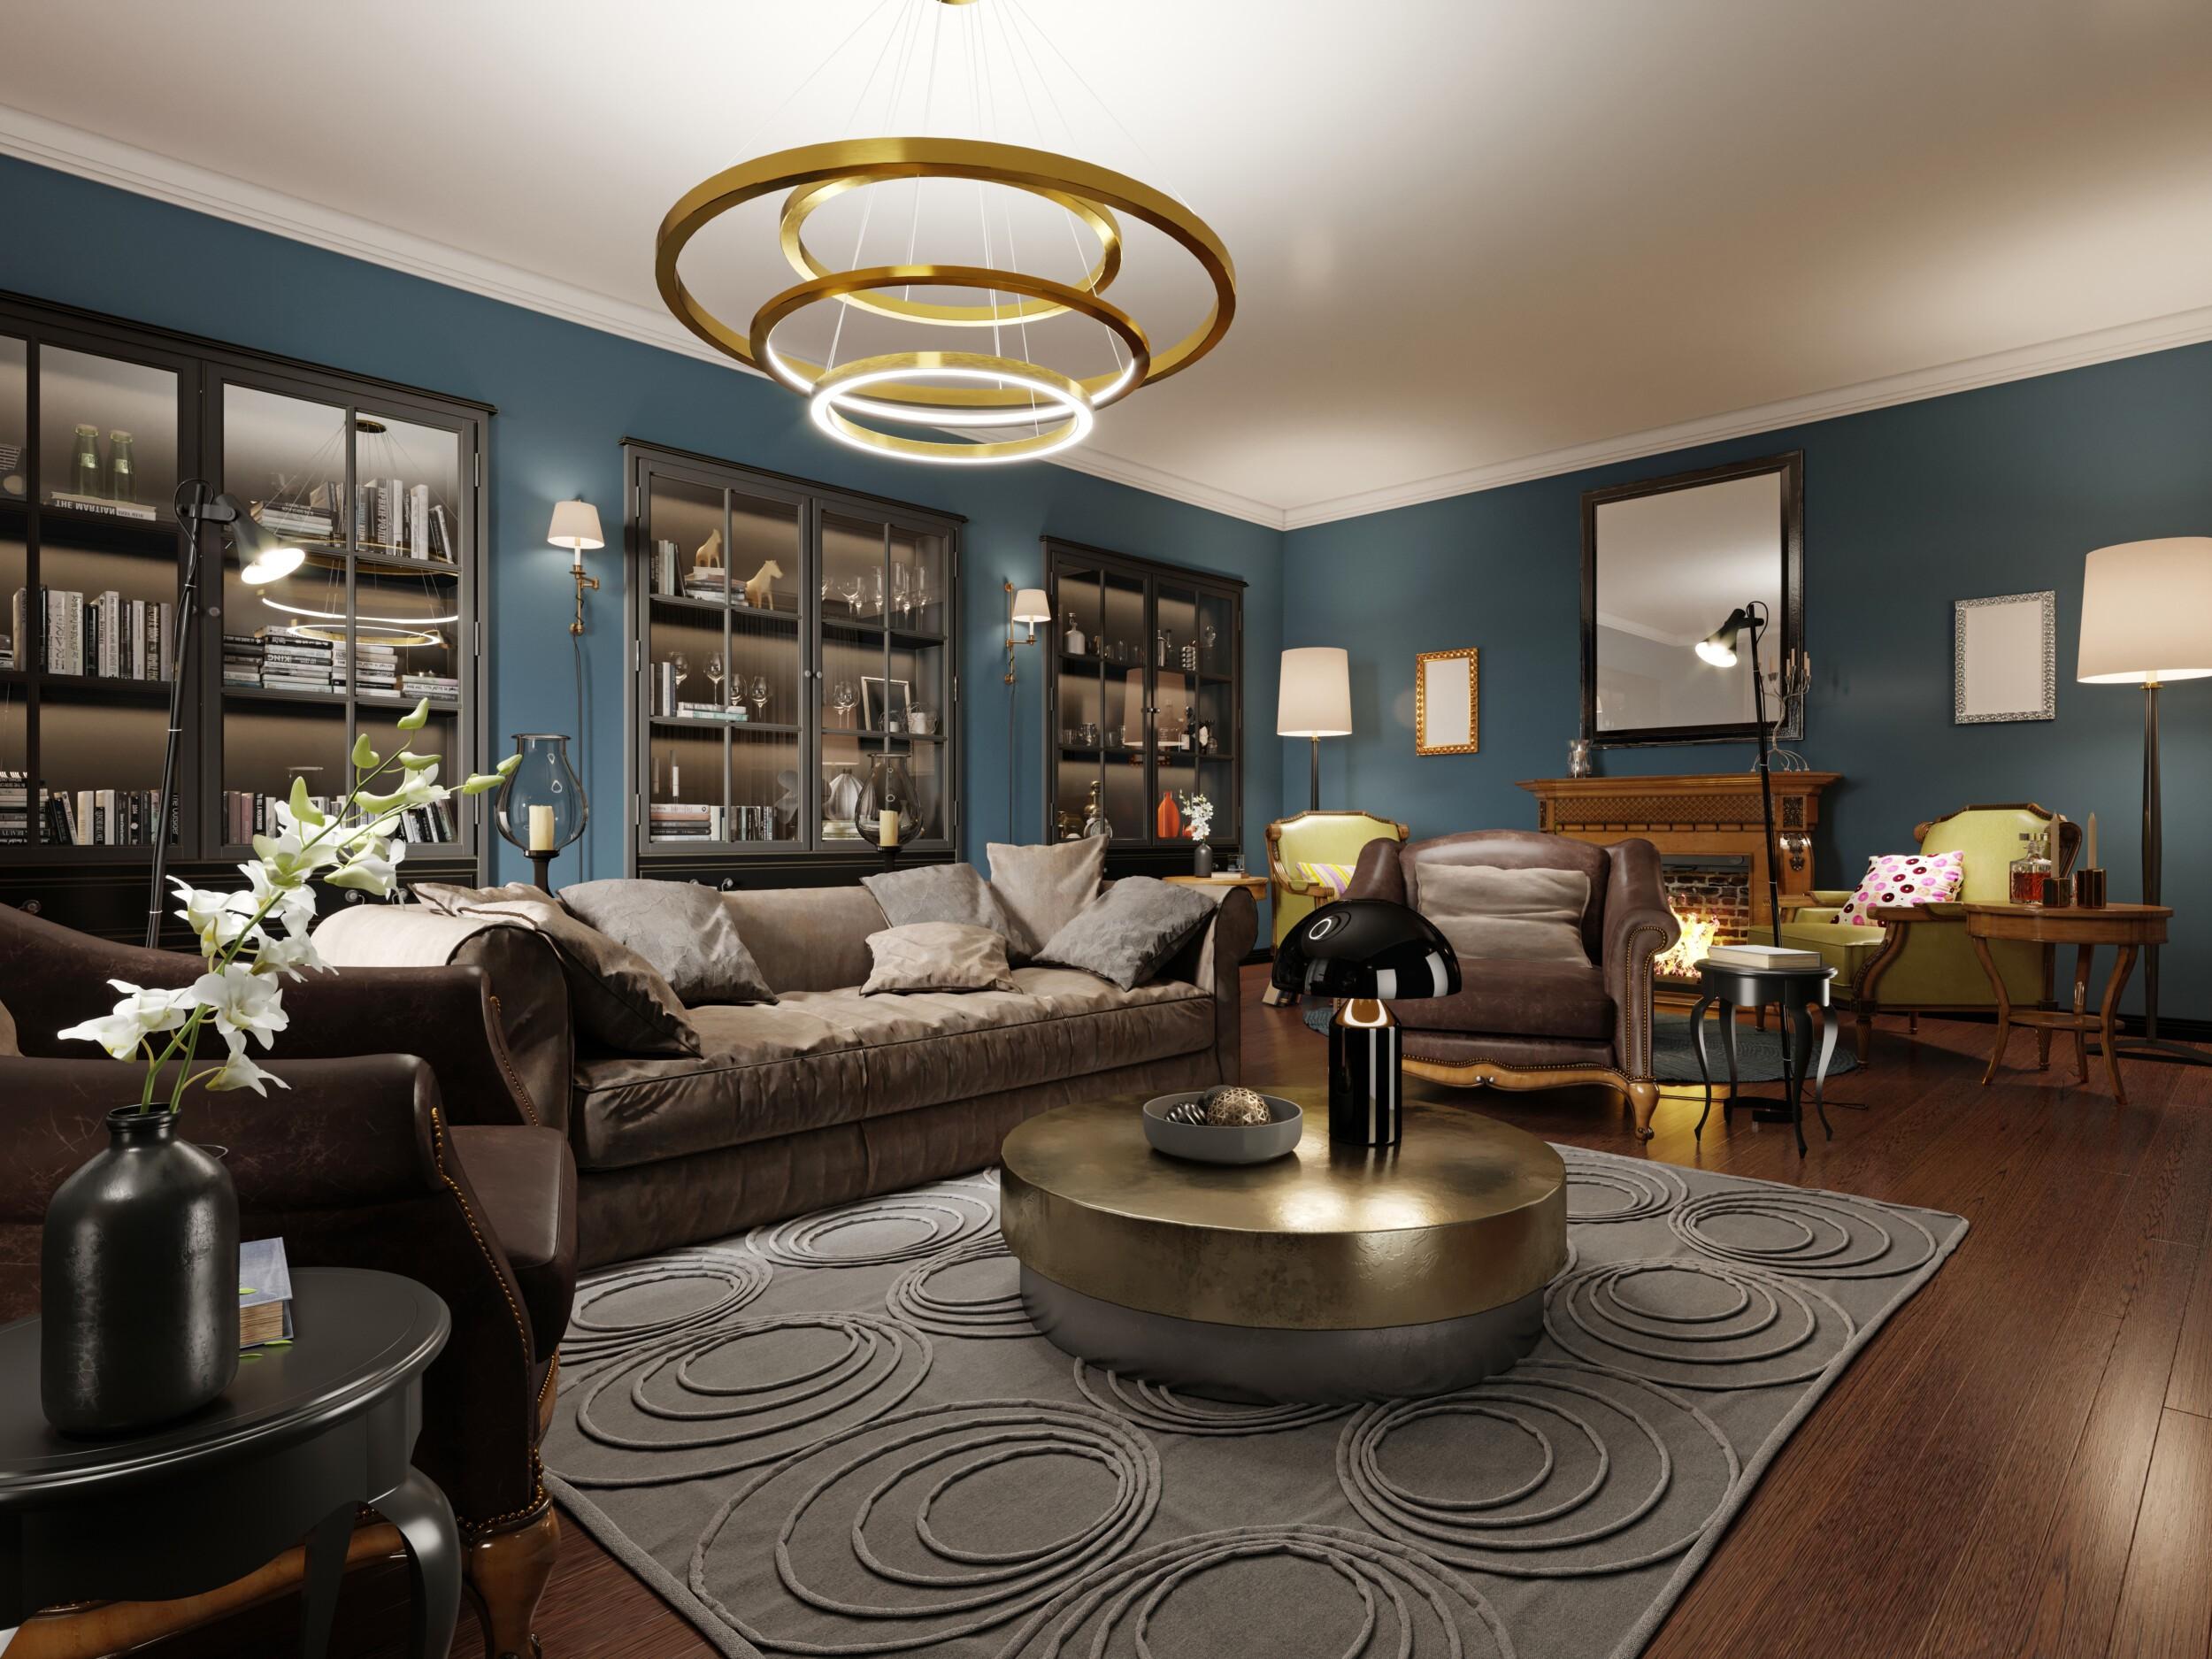 modern eclectic living room in dark colors